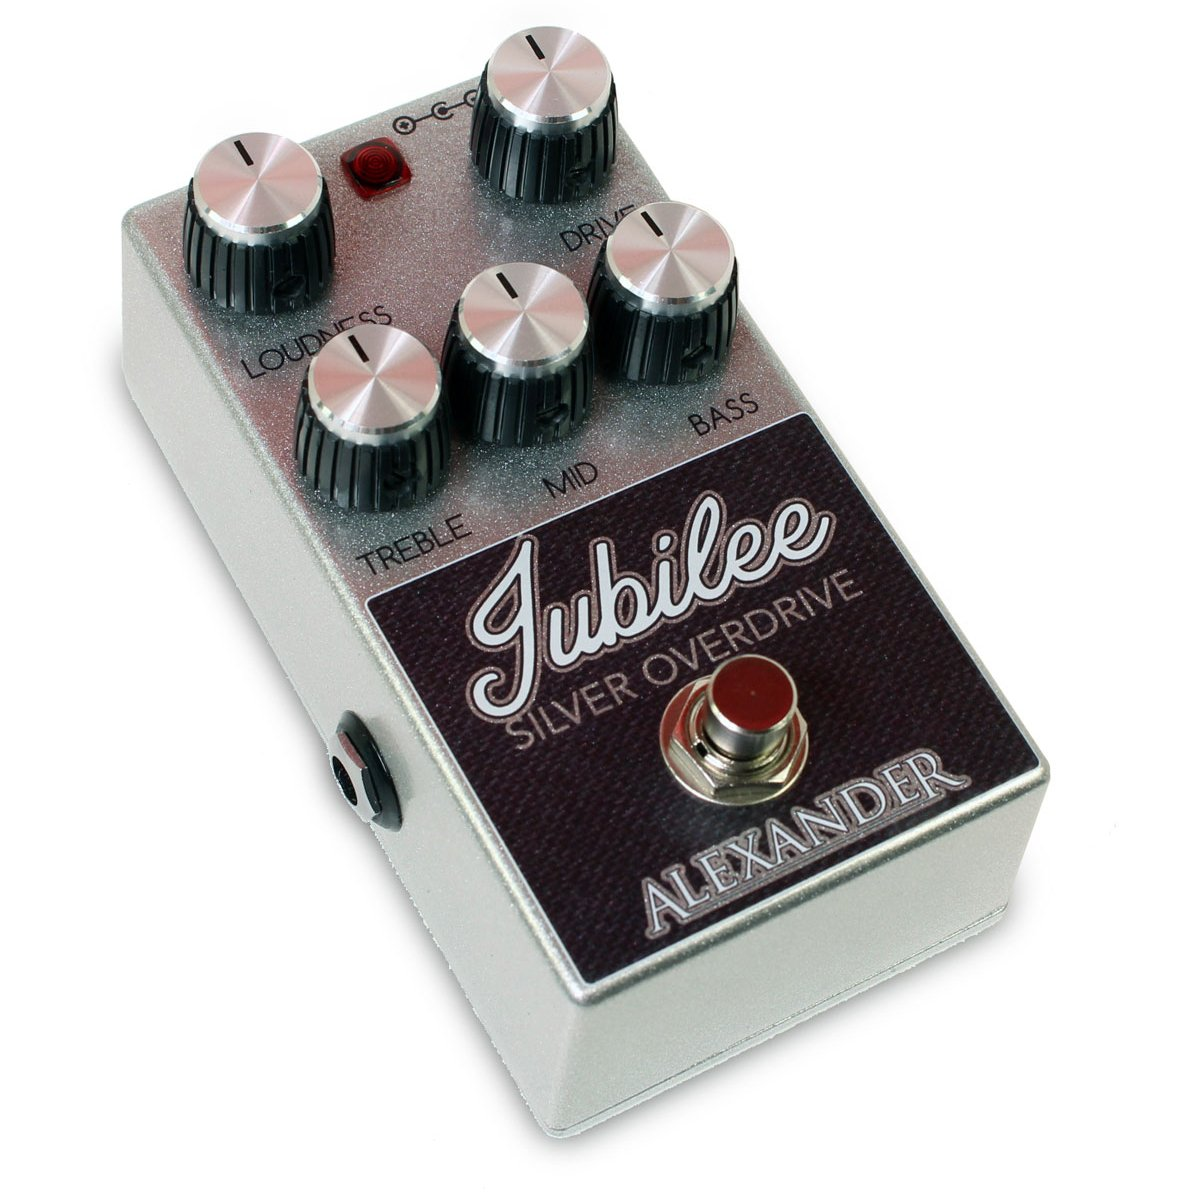 Jubilee Silver Overdrive